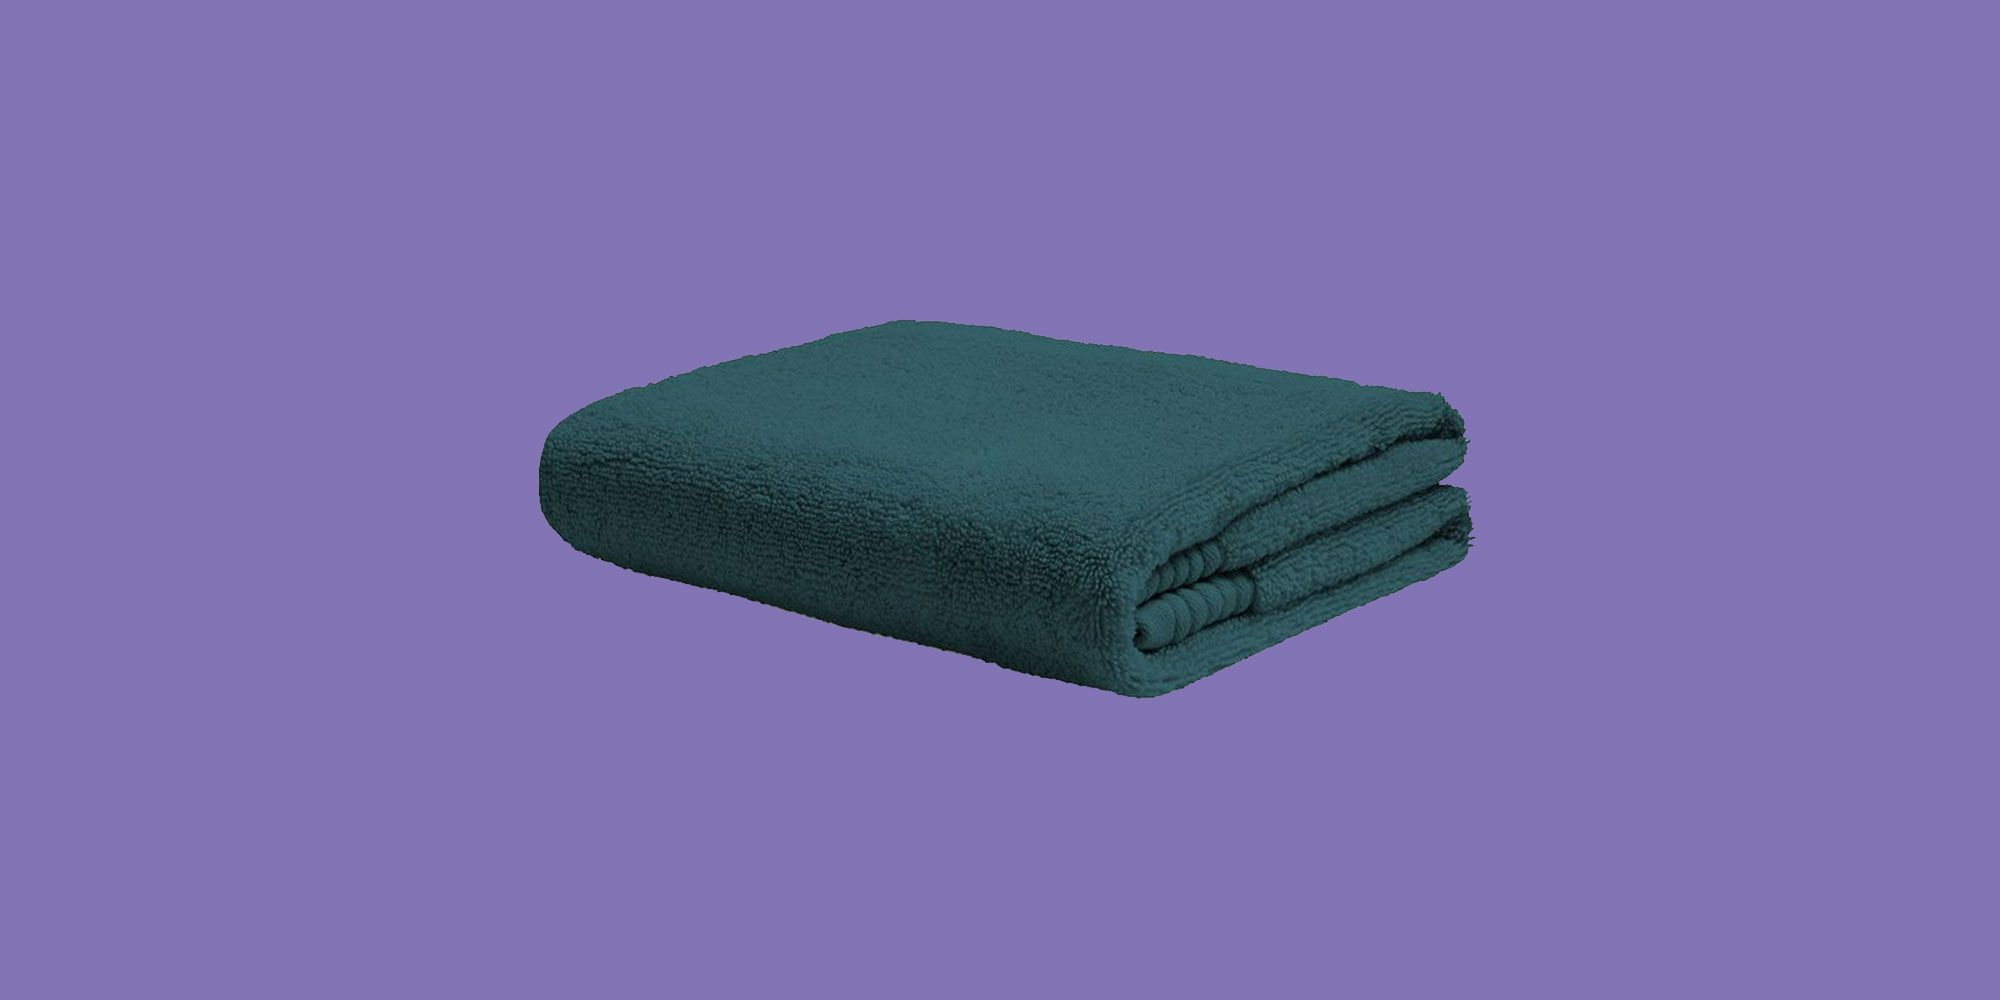 Primark Ultra Soft 100% Cotton Bath Towel